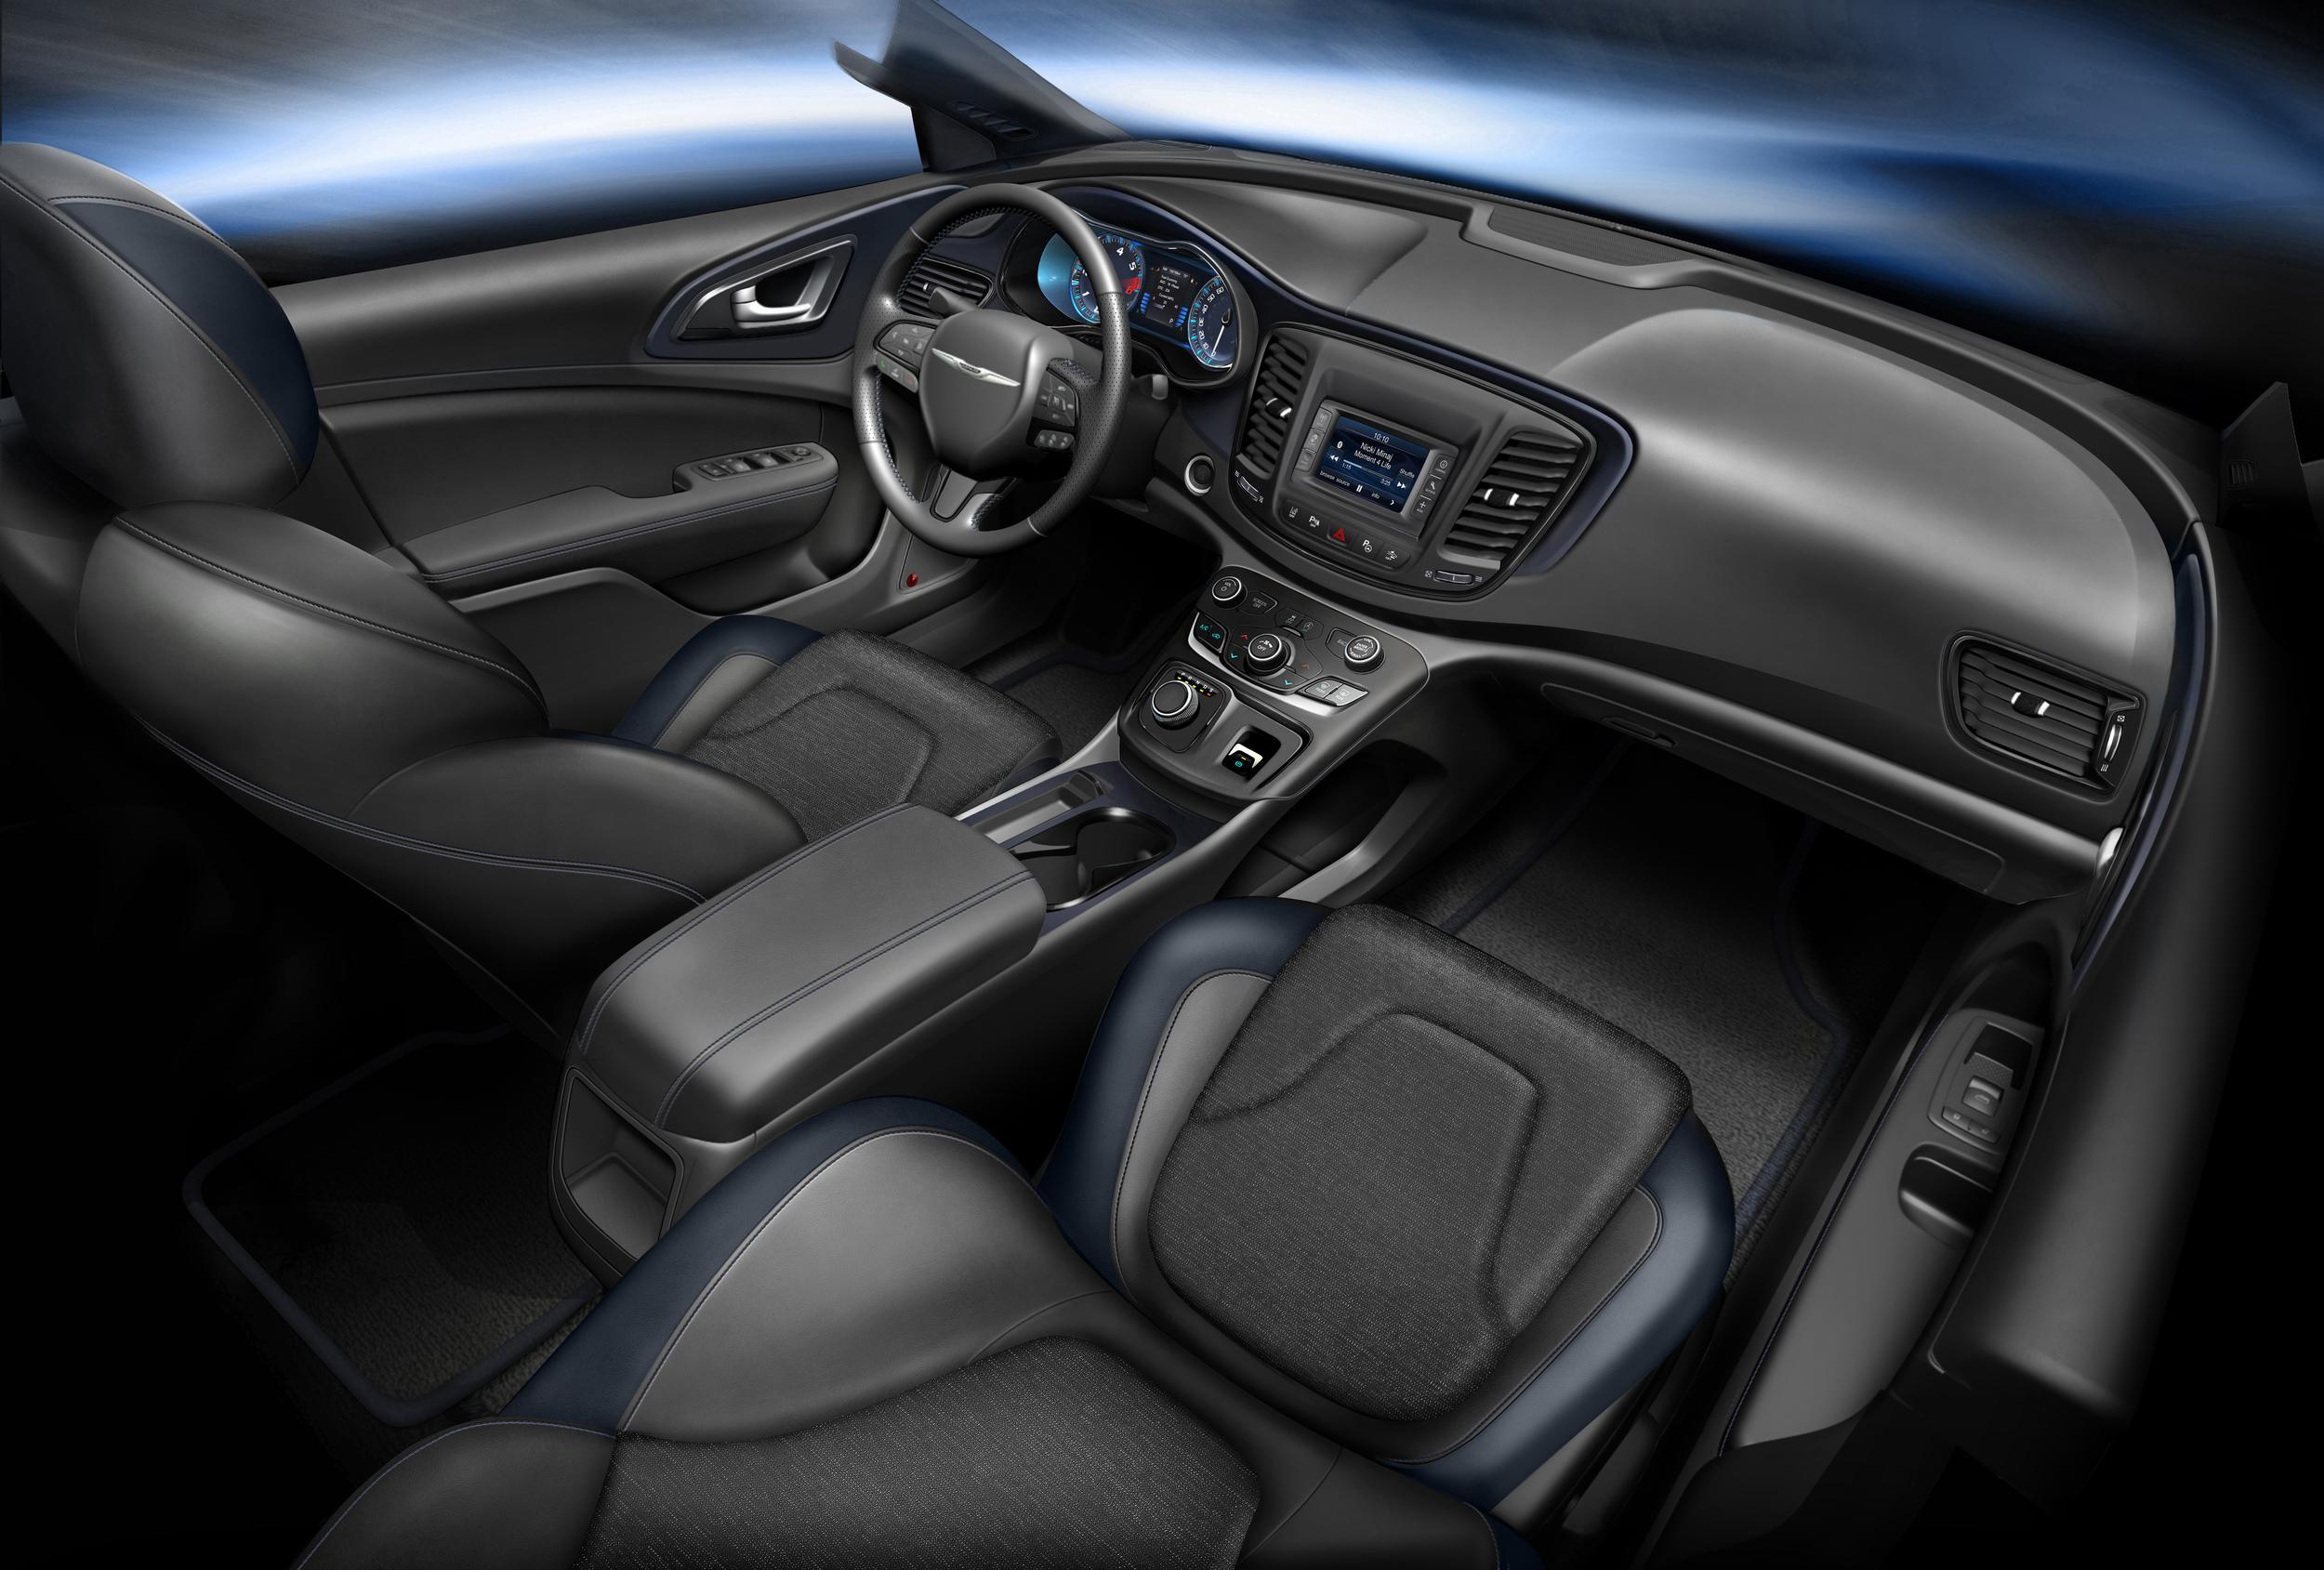 2014 Chrysler 200 gauge design